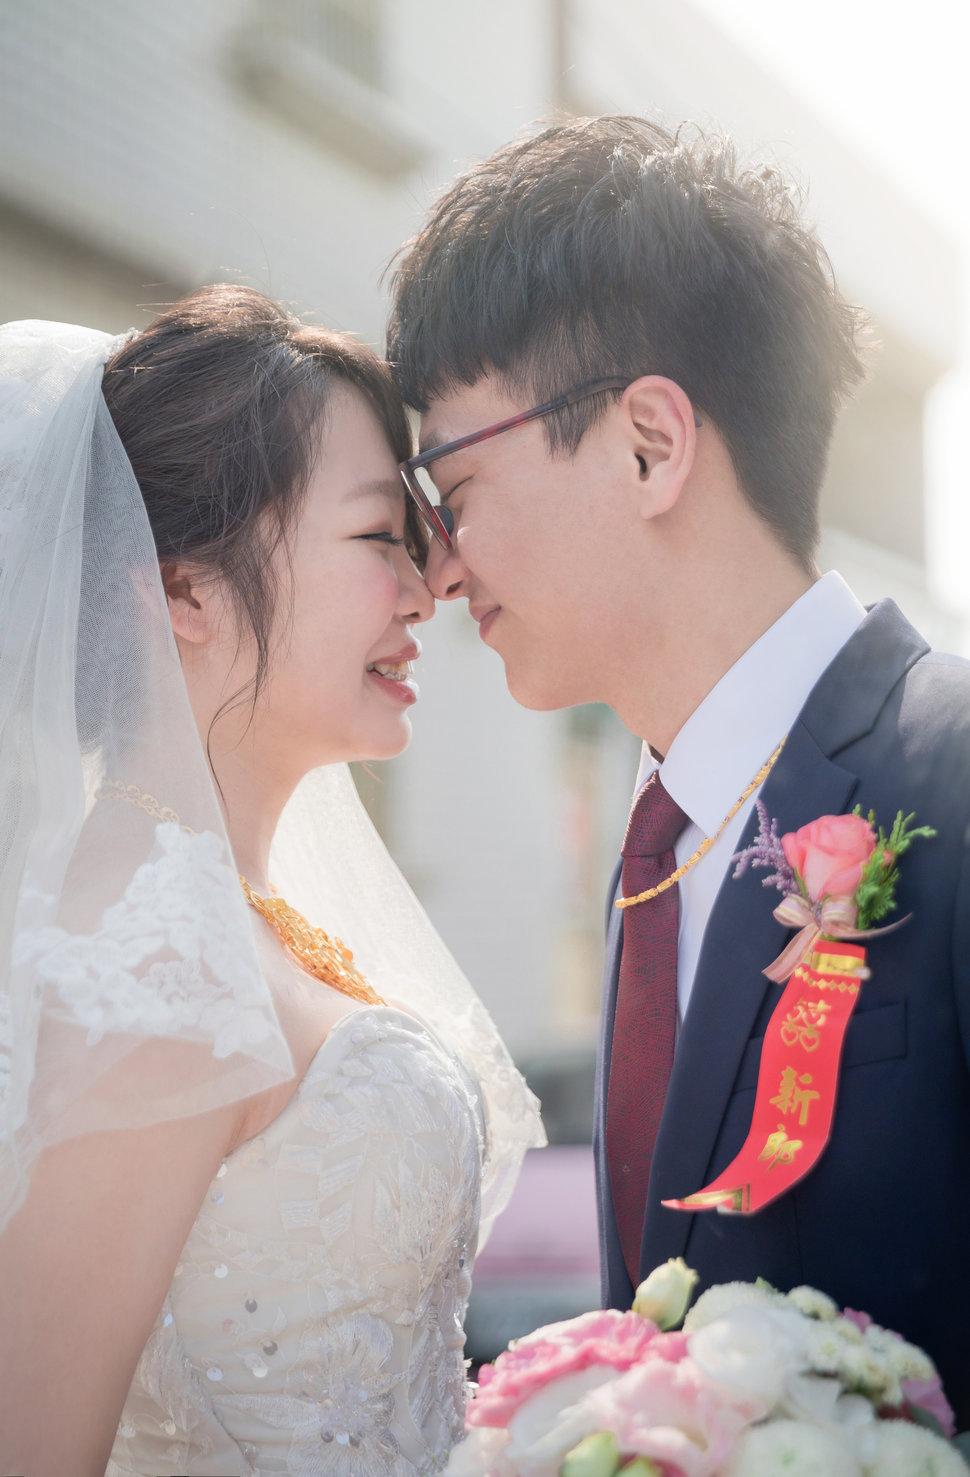 IMG_6613 - J Photographer《結婚吧》